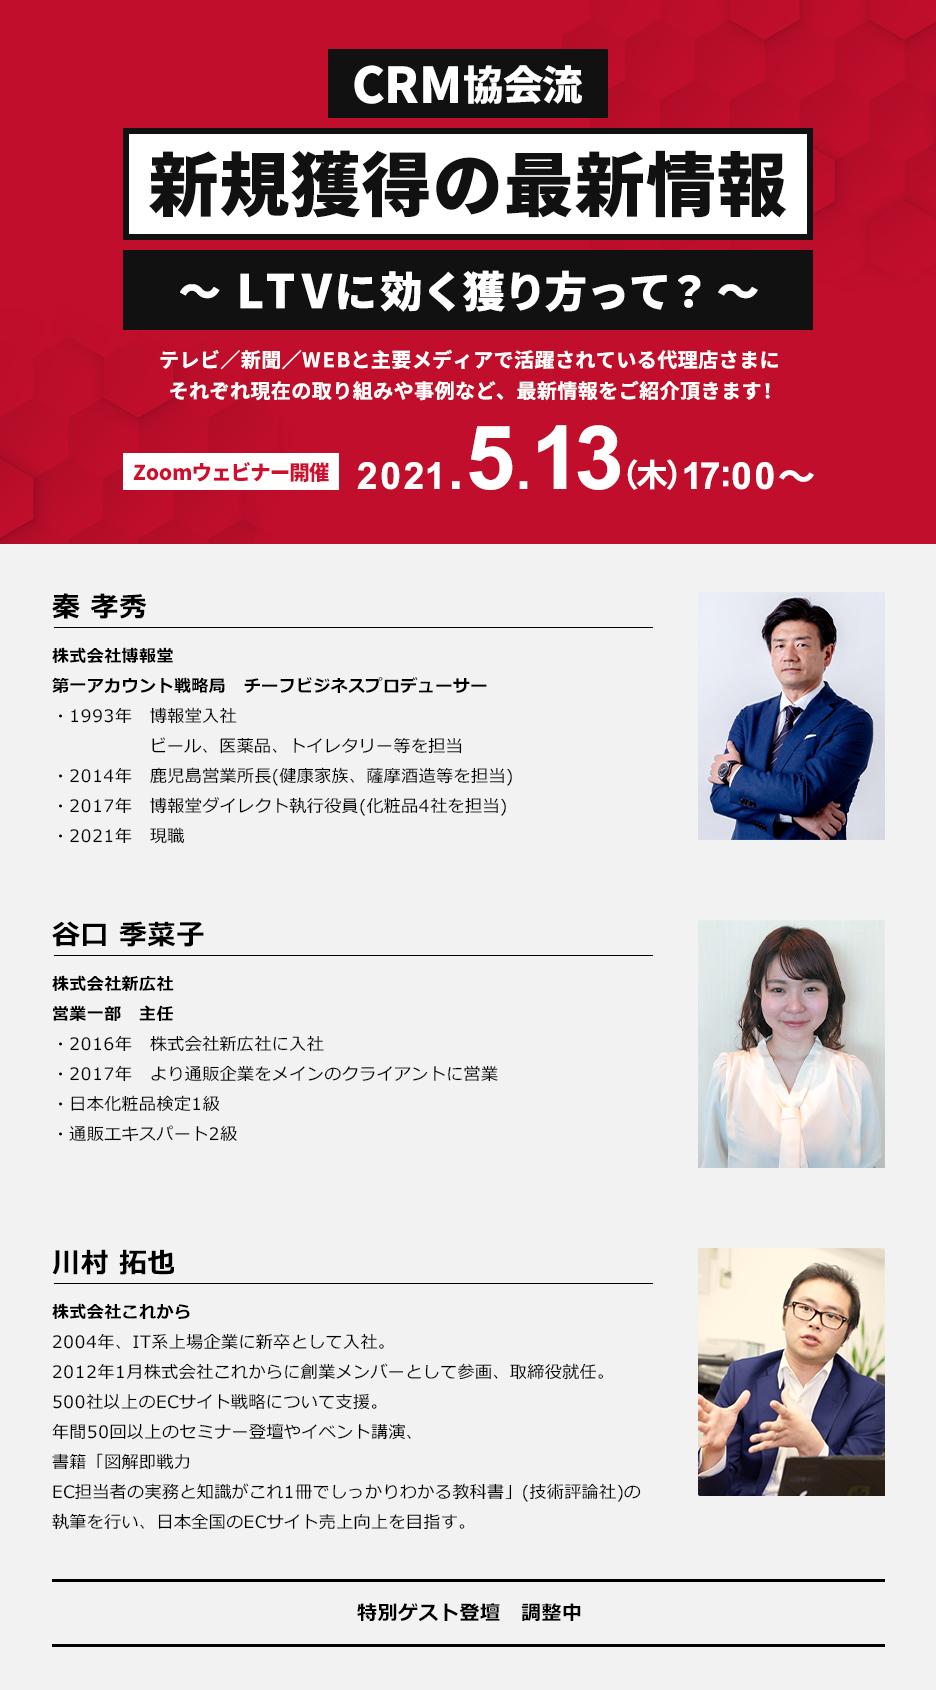 【CRM協会流!】新規獲得の最新情報 ~LTVに効く獲り方って?~